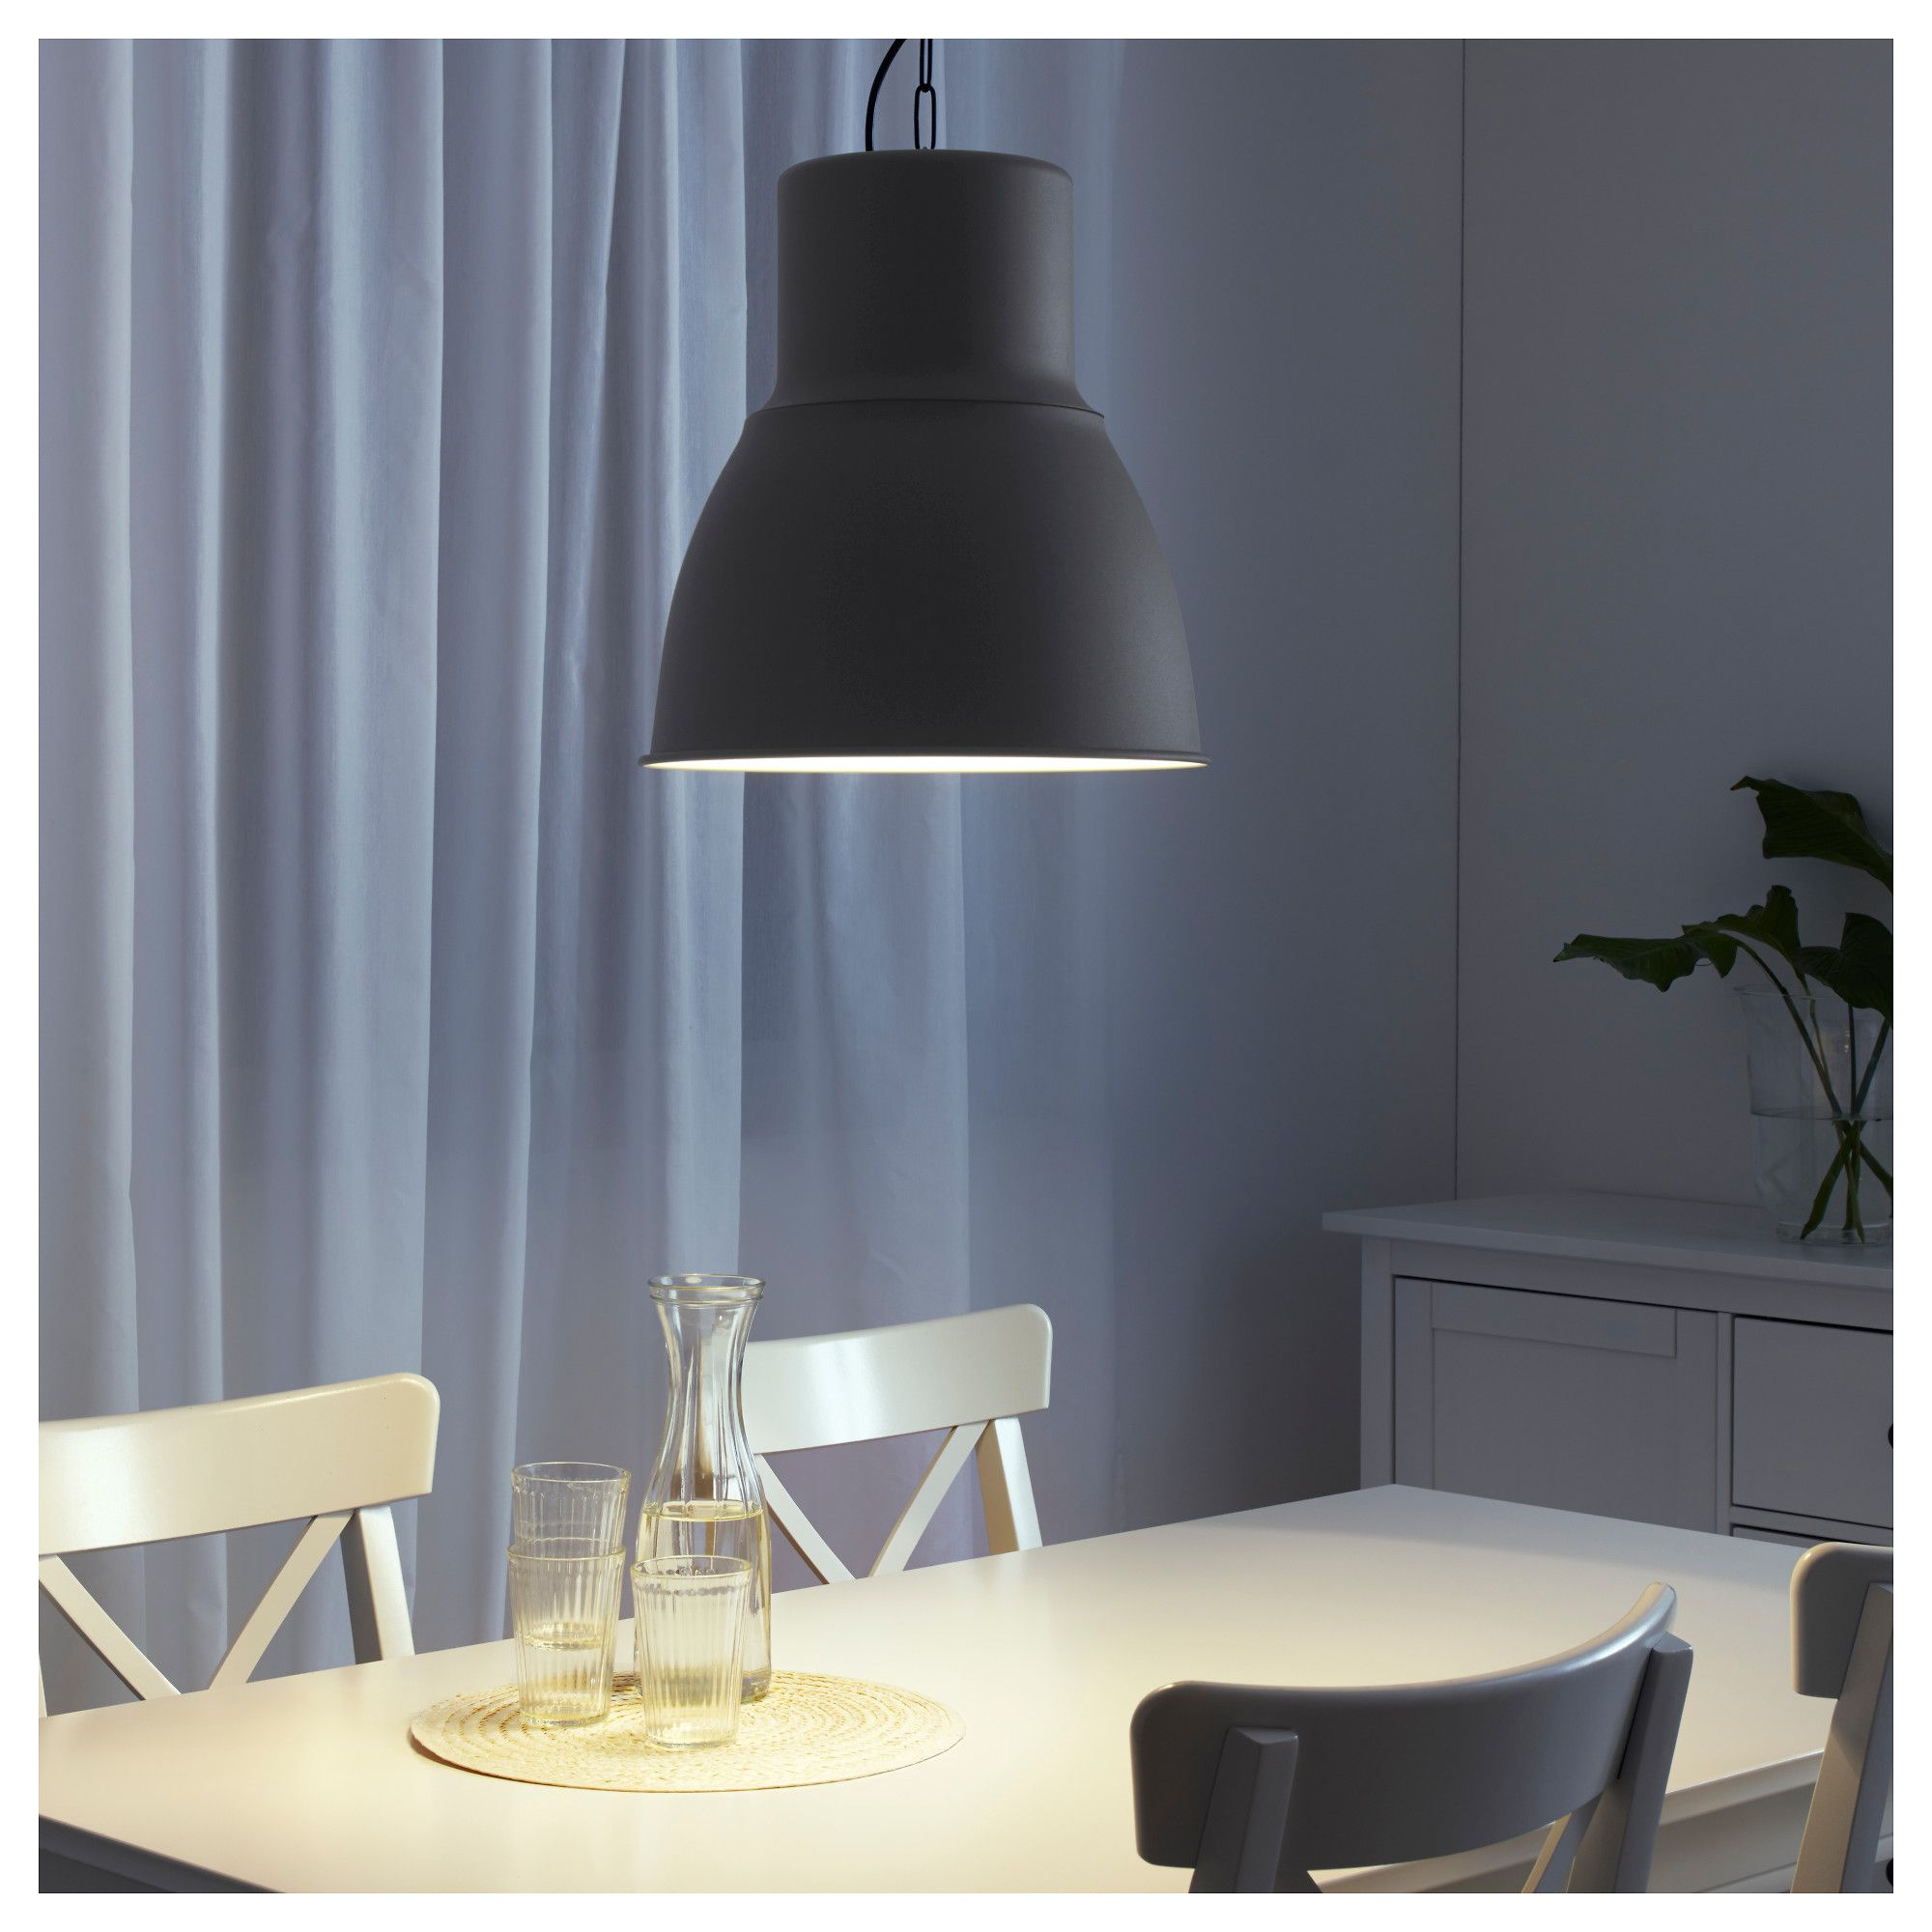 Furniture and Home Furnishings   Pendant lamp, Pendant light